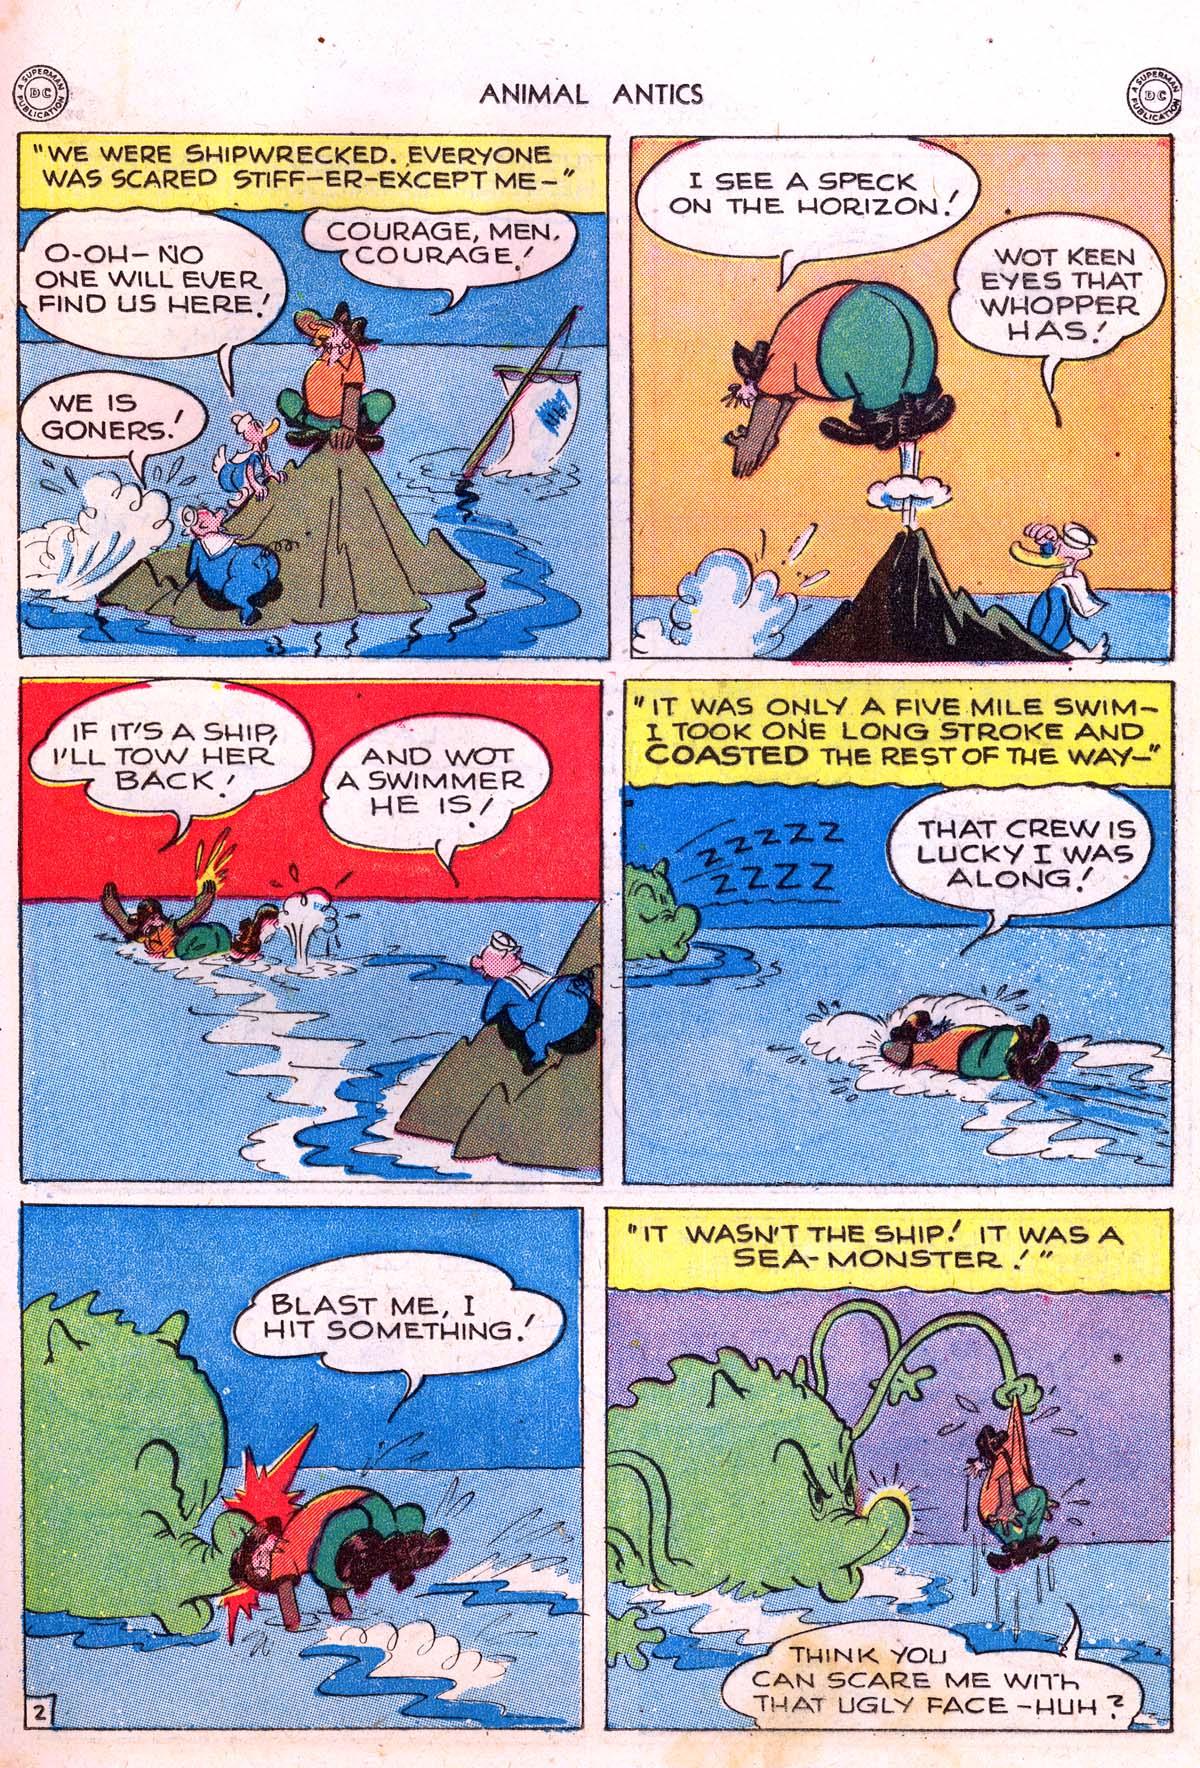 Read online Animal Antics comic -  Issue #5 - 23